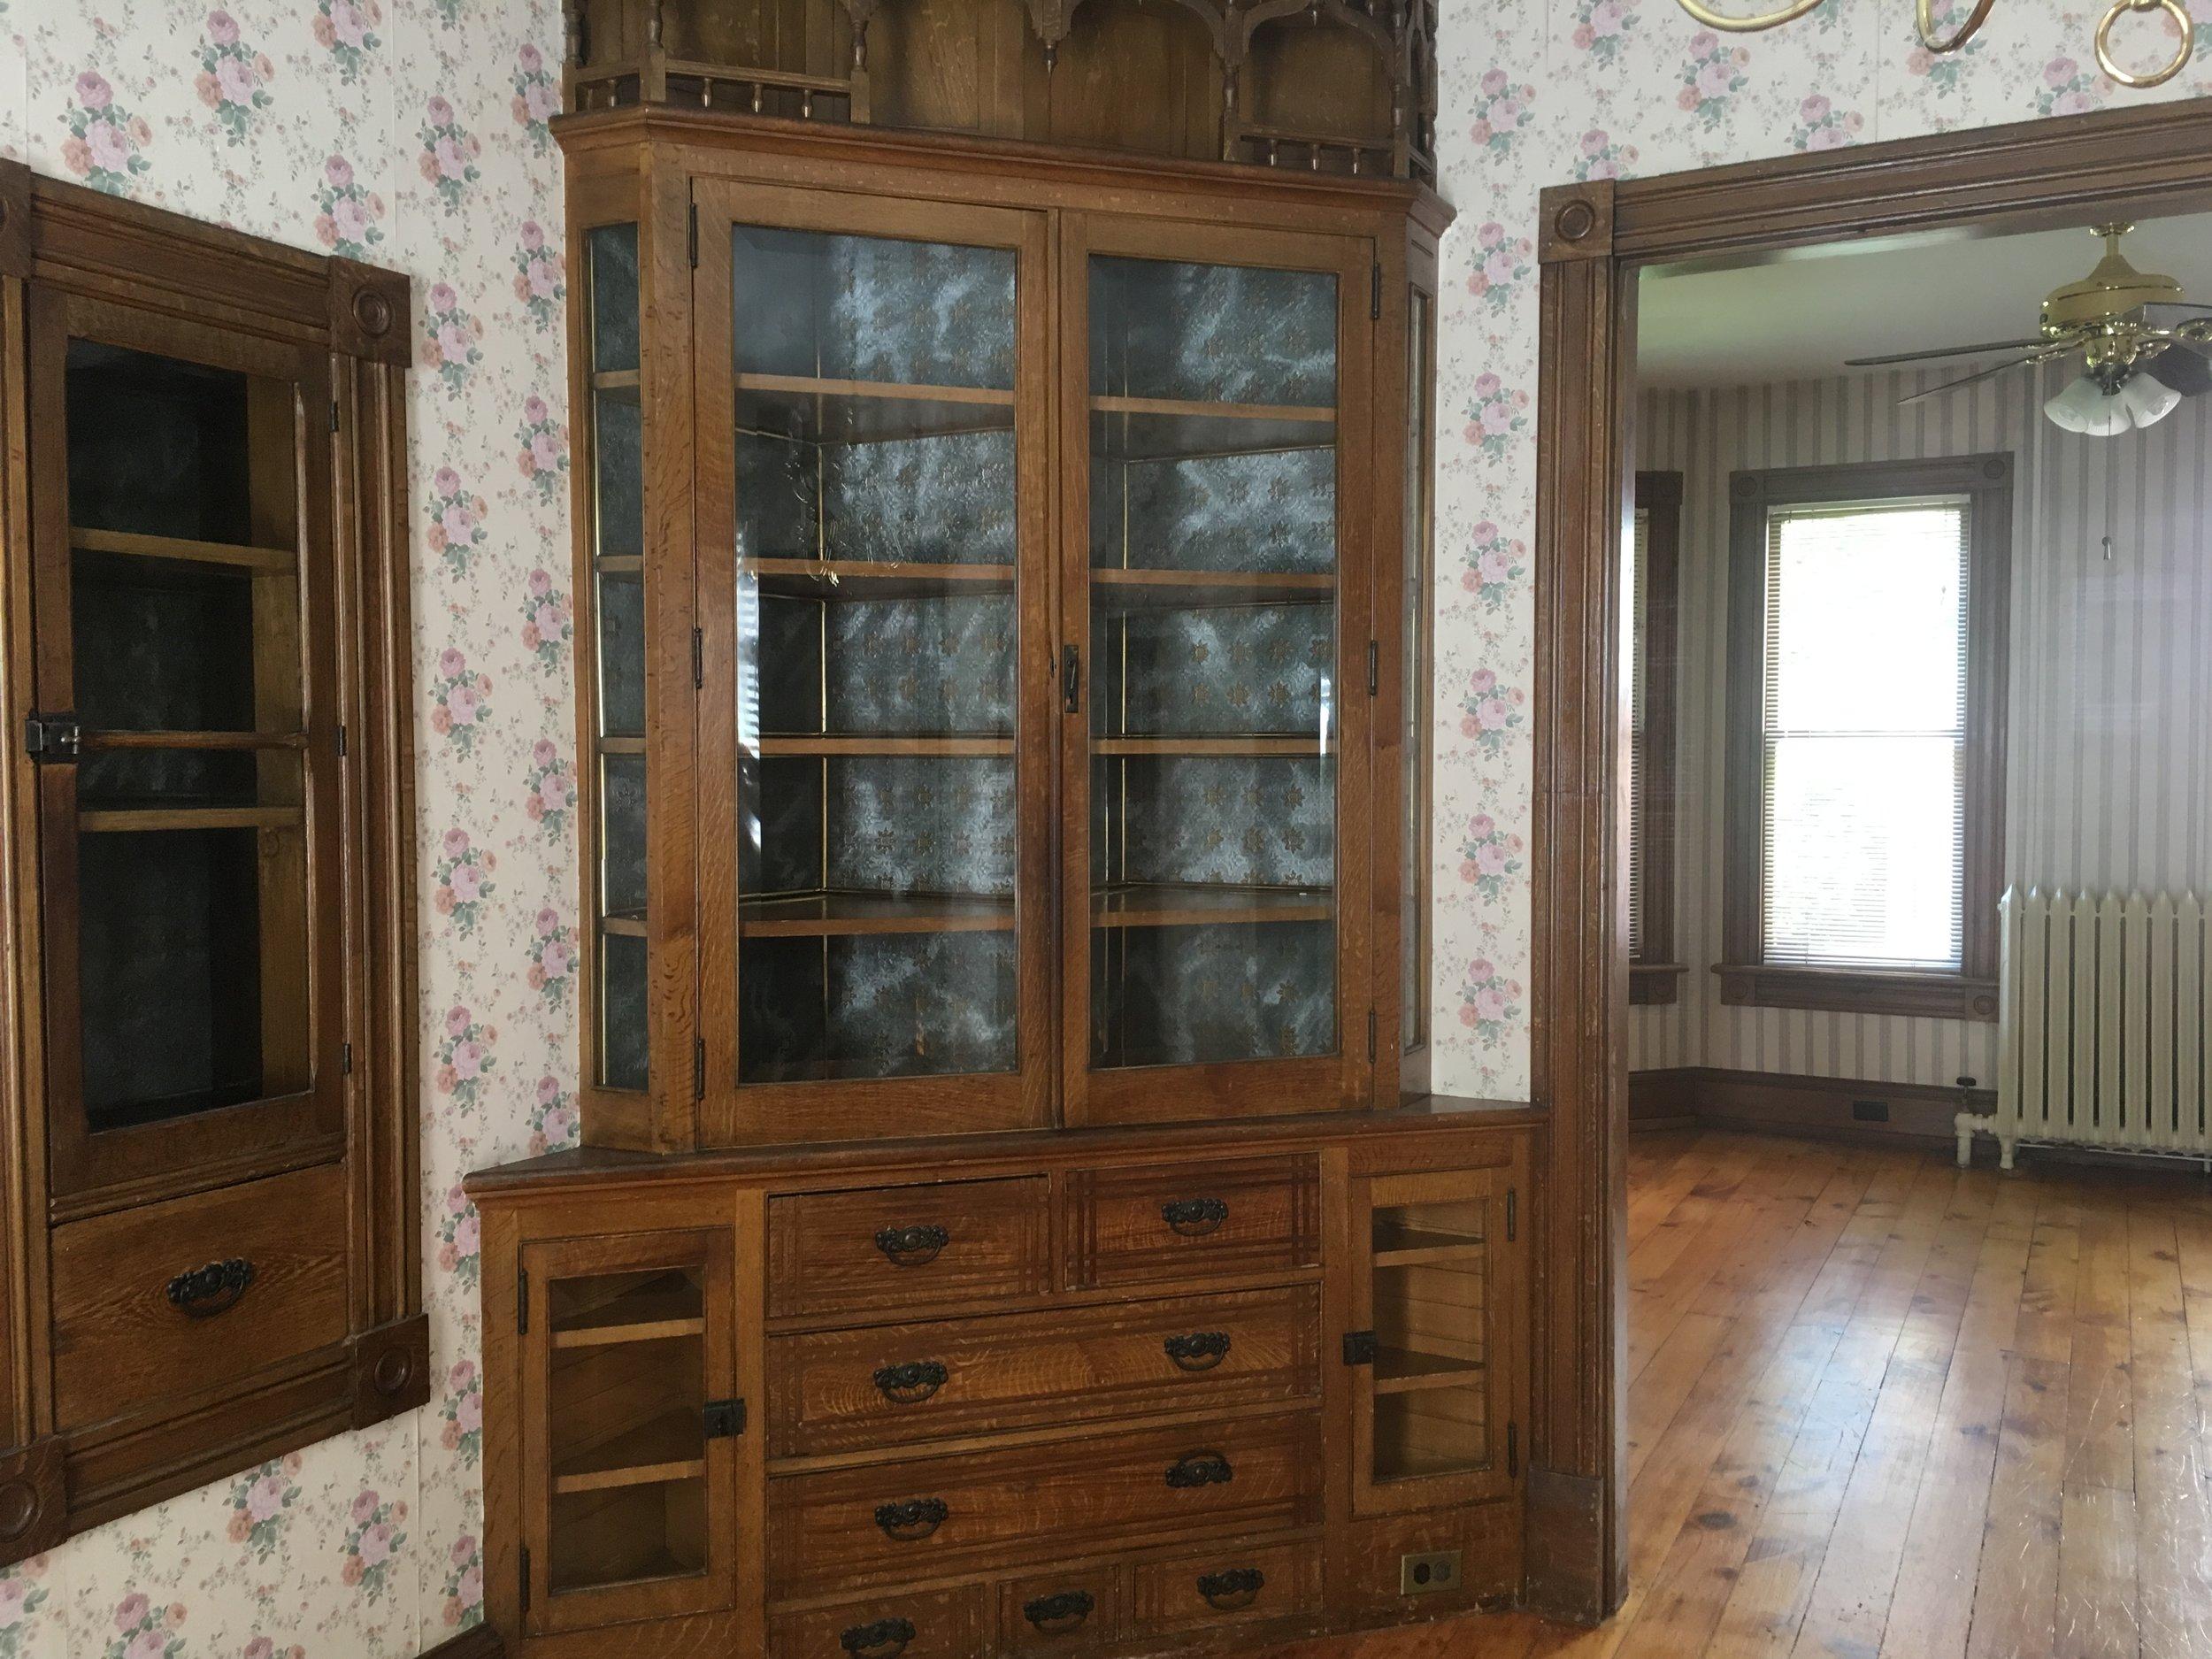 Built-ins, wallpaper, woodwork, wood floors, radiators, all the good stuff.